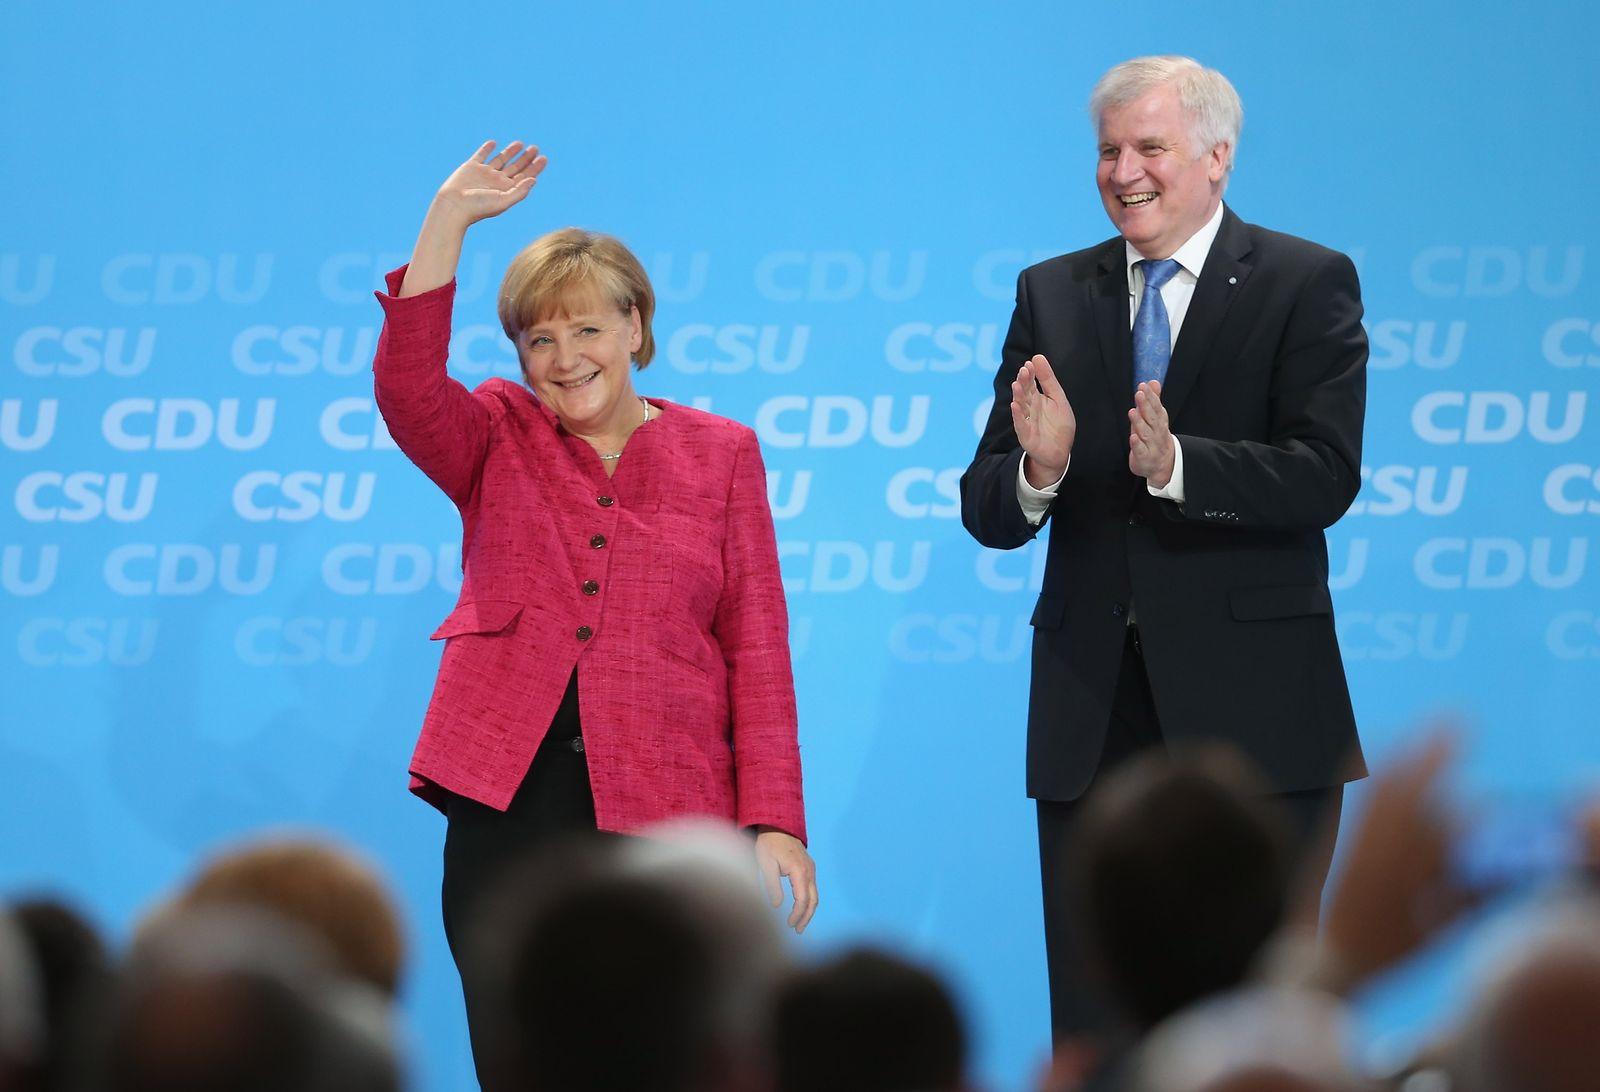 Merkel/Seehofer